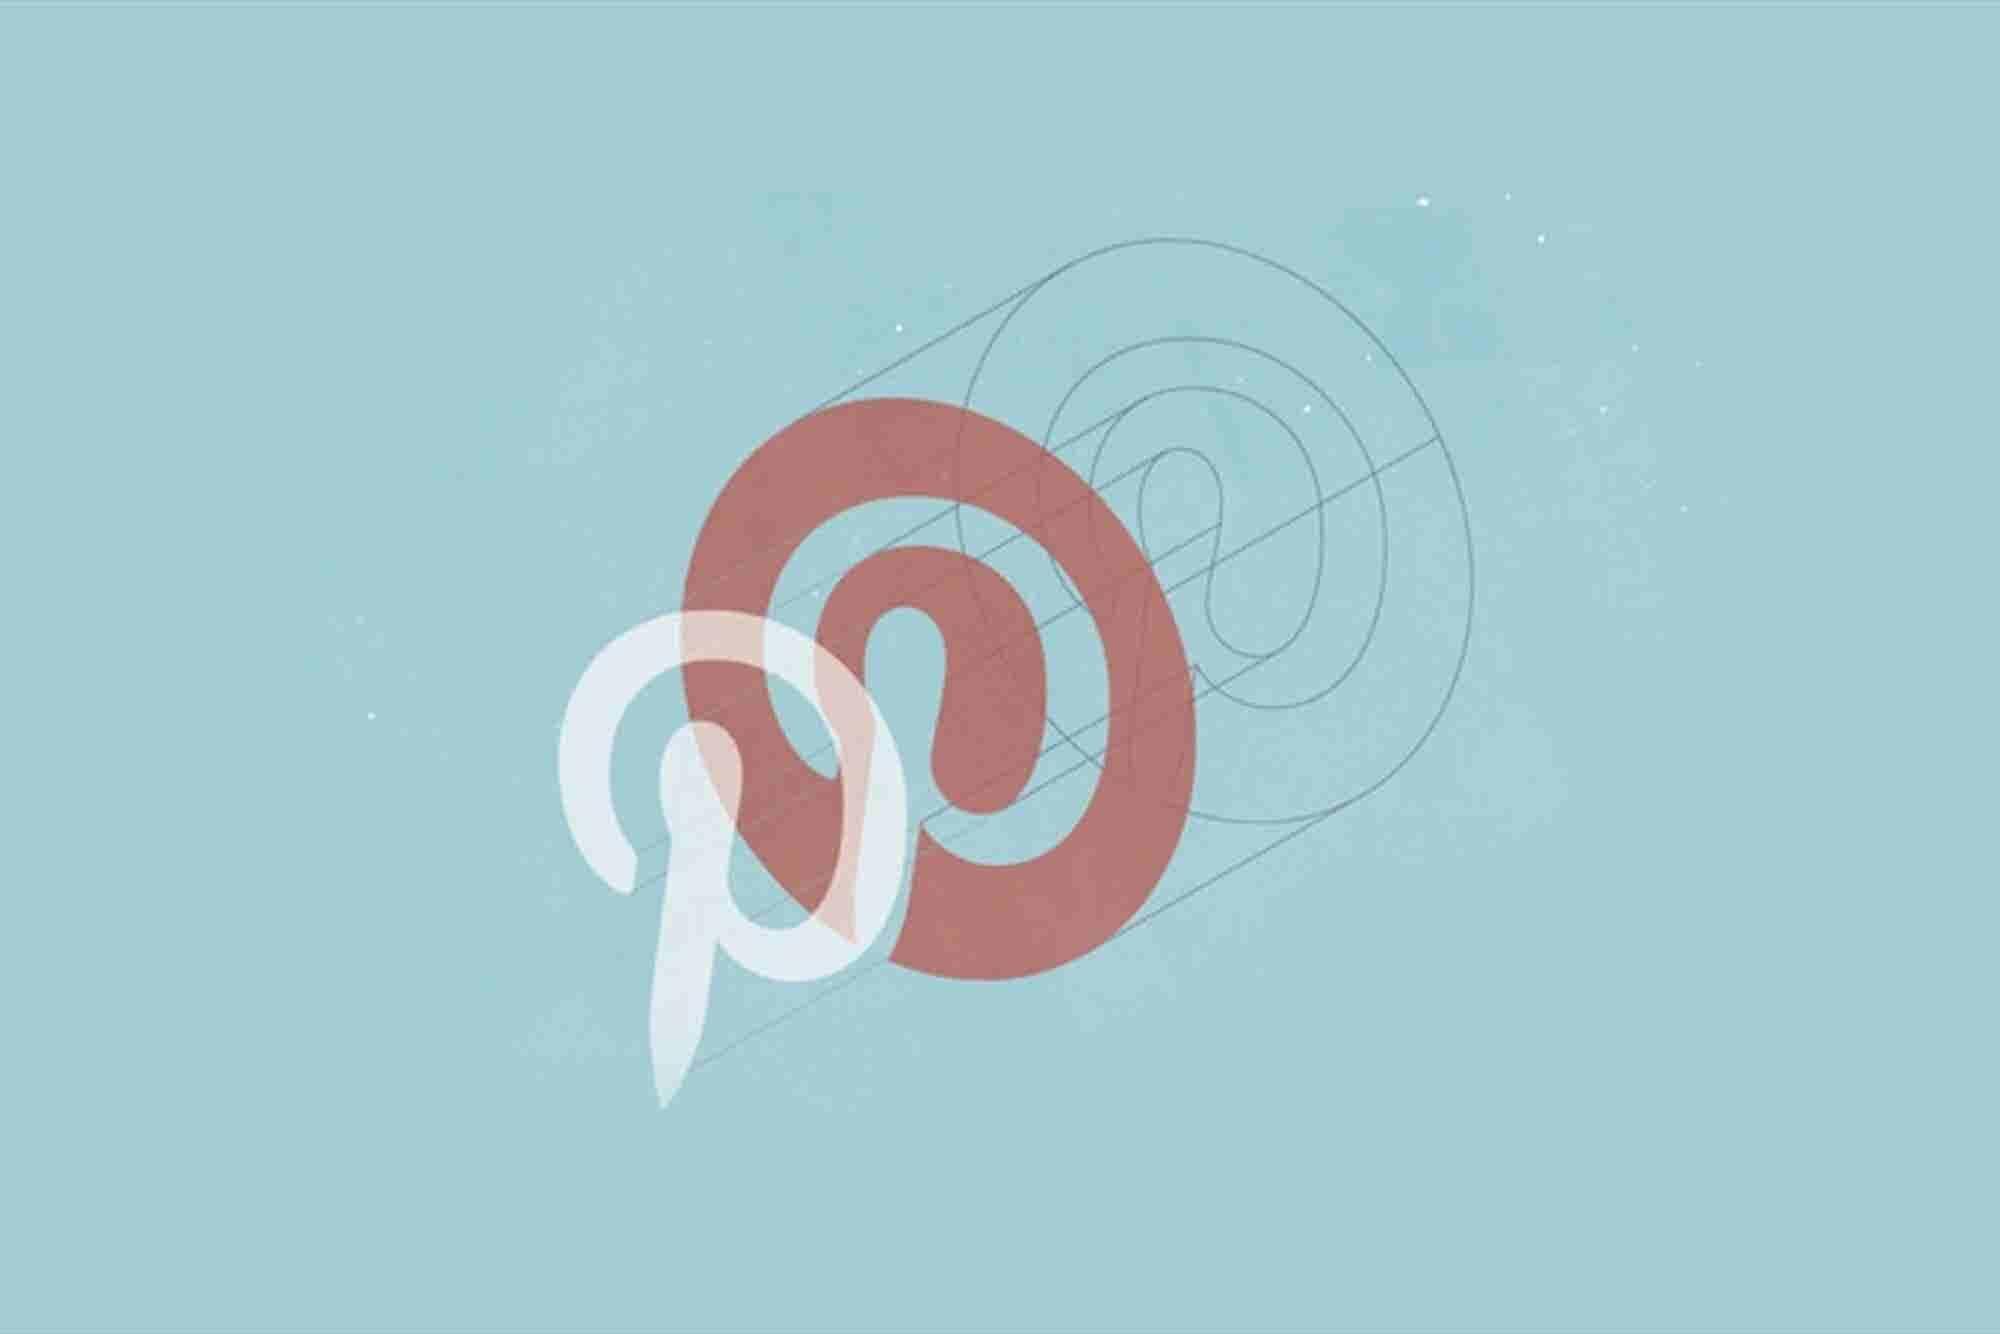 Pinterest Kills Off Affiliate Links Program, Leaves 'Power Pinners' in the Lurch